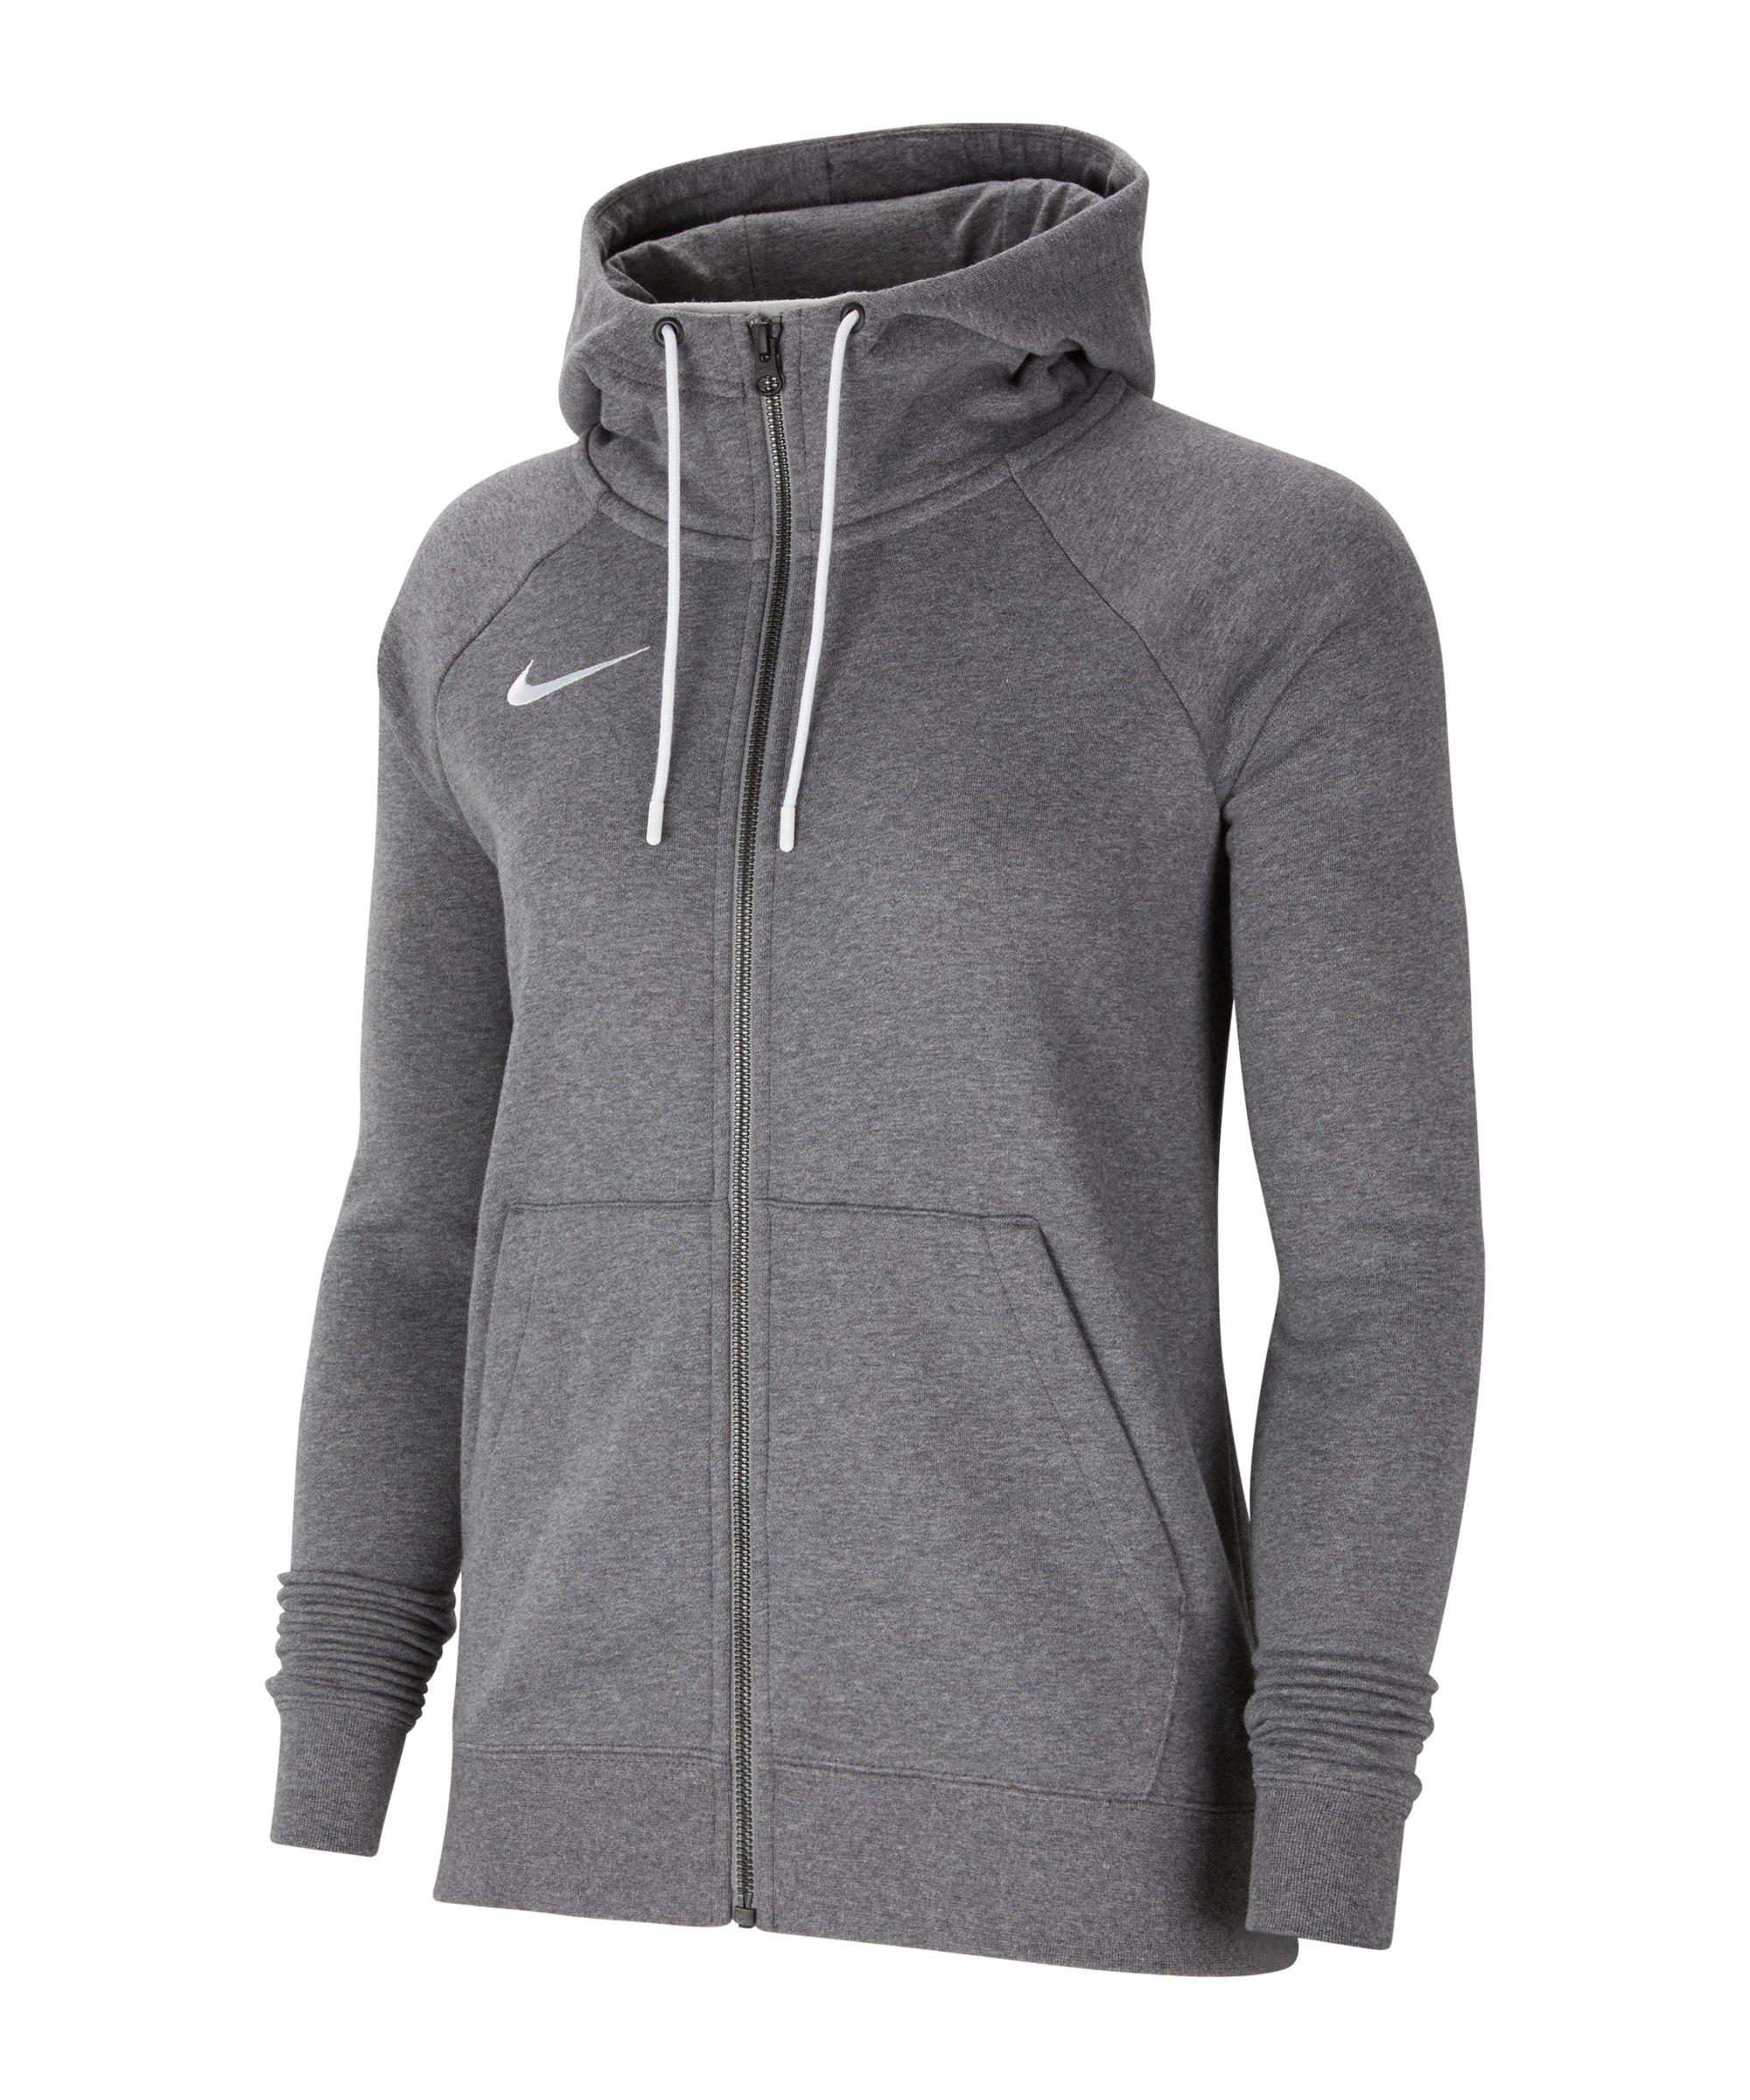 Nike Park 20 Fleece Kapuzenjacke Damen Grau F071 - grau